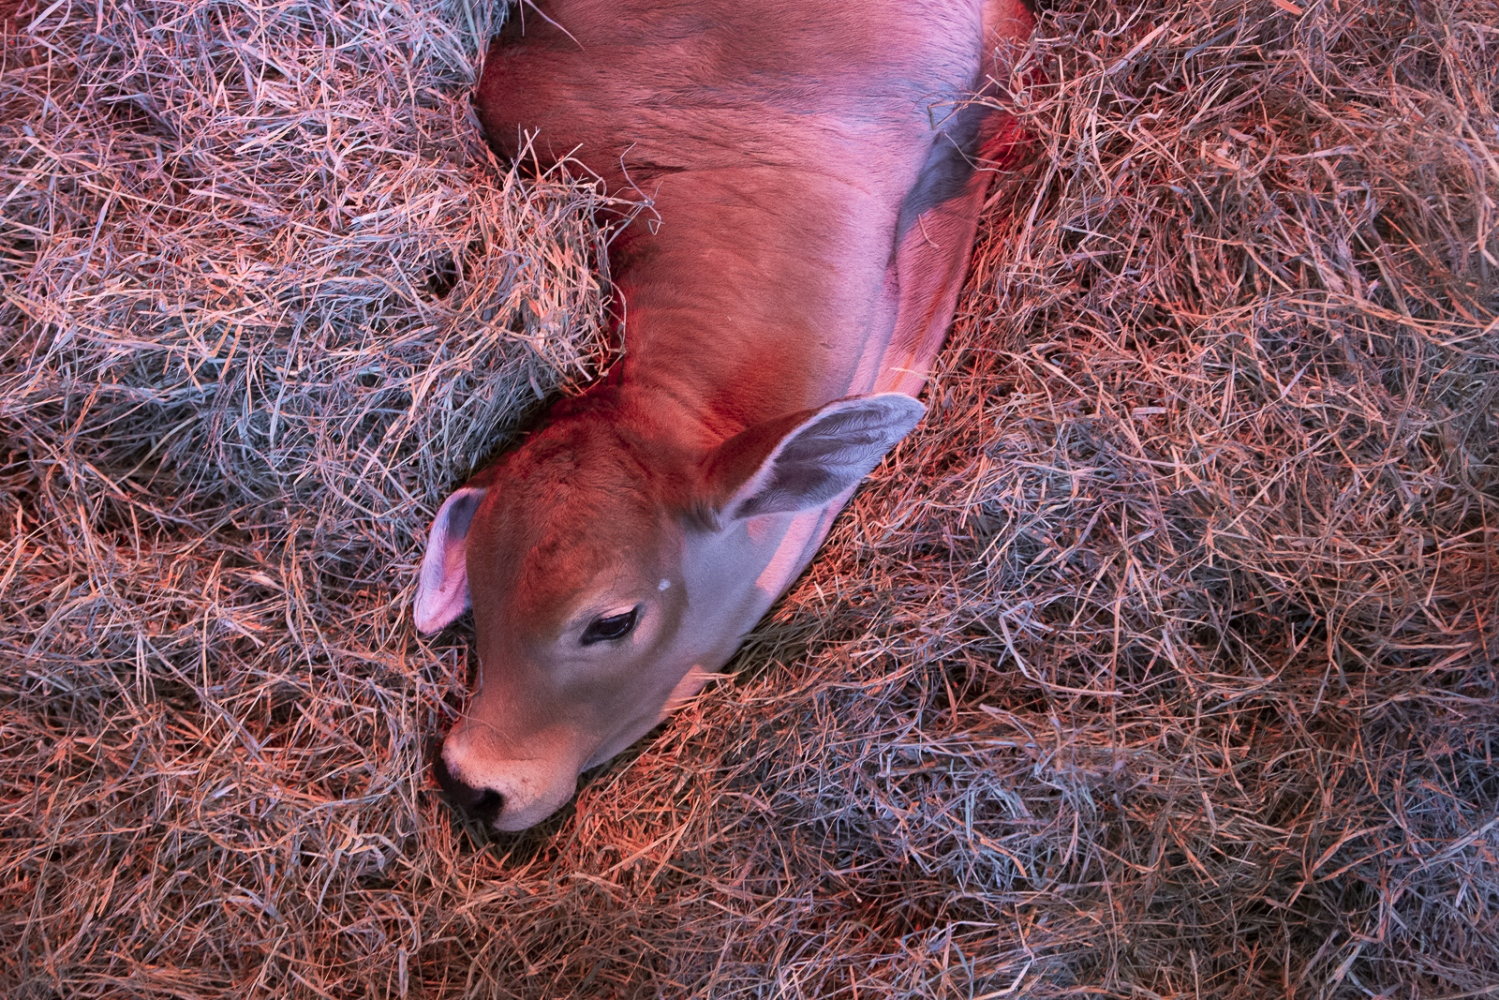 The newborn clone rests and bathes under infrared light on the manger.Uberaba, Minas Gerais, Brazil